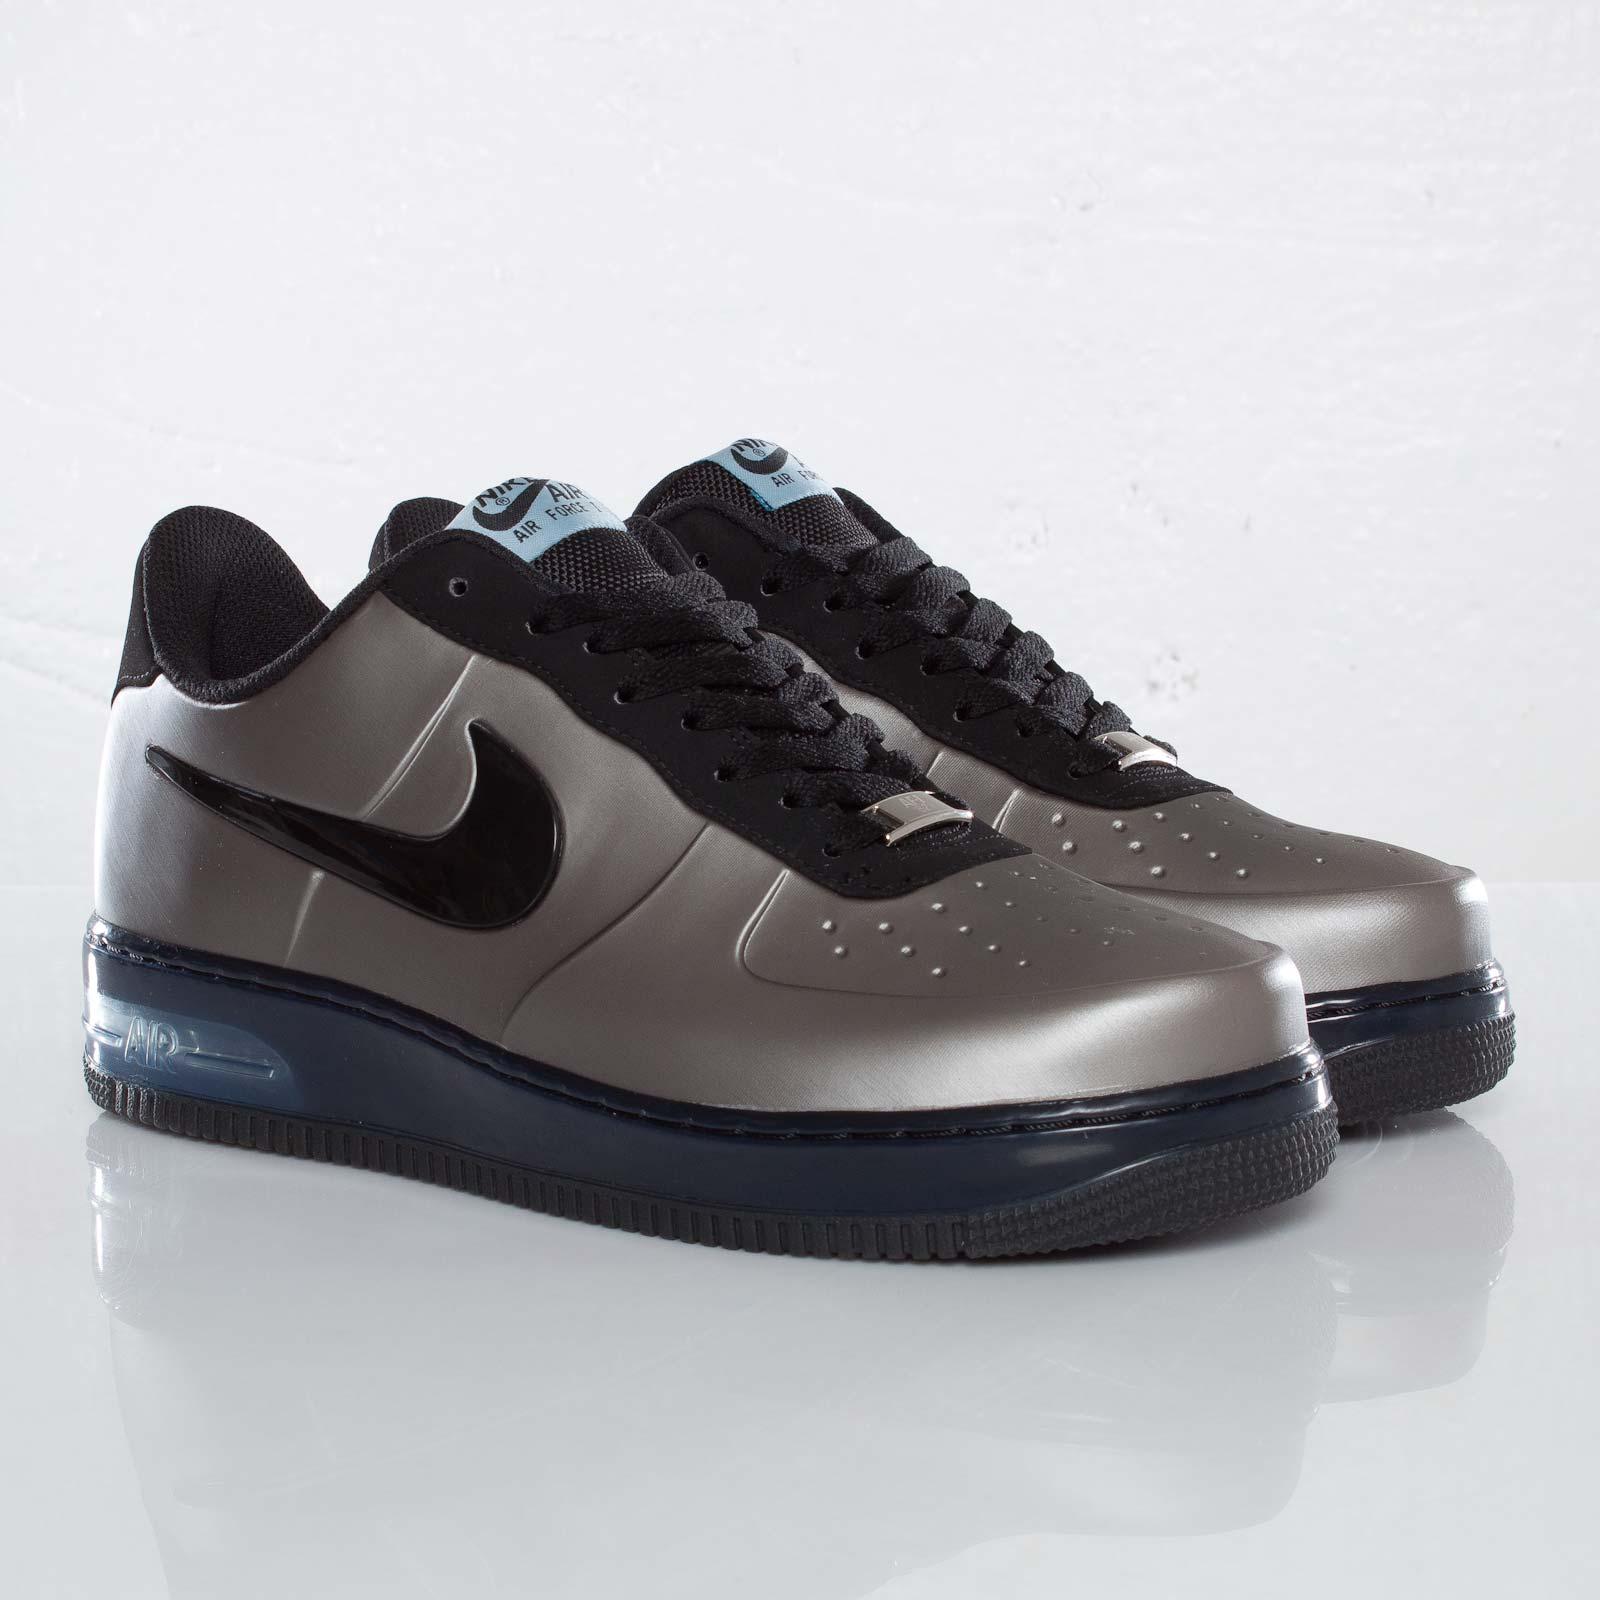 99691e1565ad7 Nike Air Force 1 Foamposite Pro Low - 532461-001 - Sneakersnstuff ...